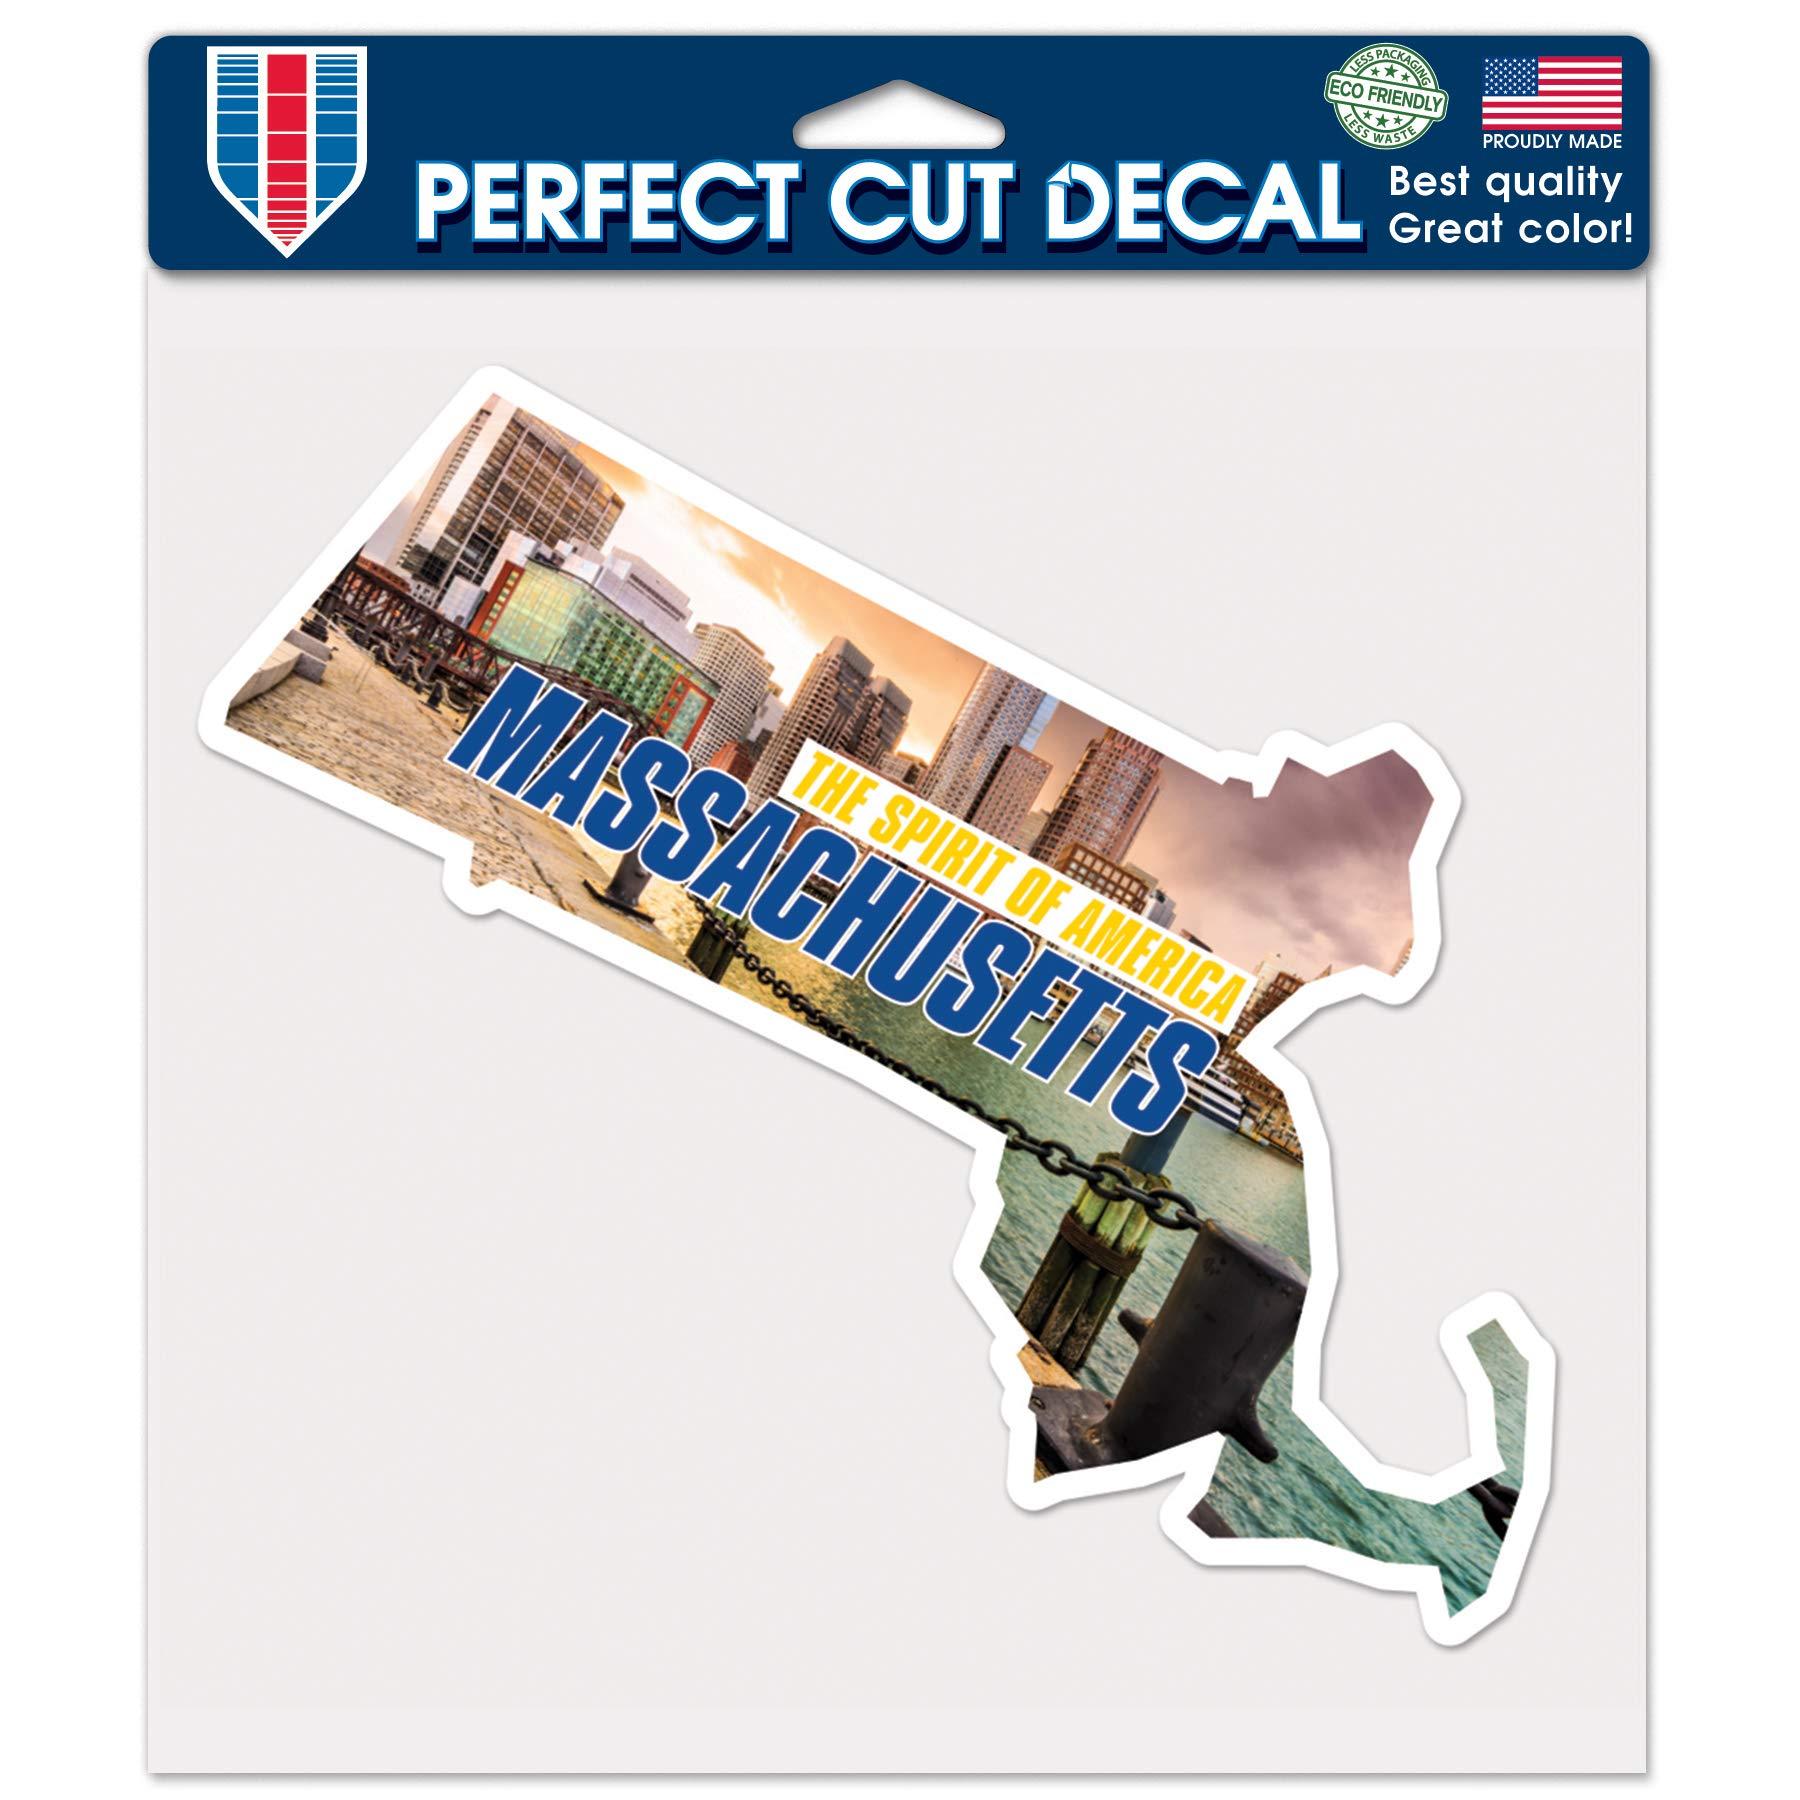 WinCraft Destination North Carolina State//North Carolina Perfect Cut Color Decal 4 x 4State//North Carolina Perfect Cut Color Decal 4 x 4 NA Multi